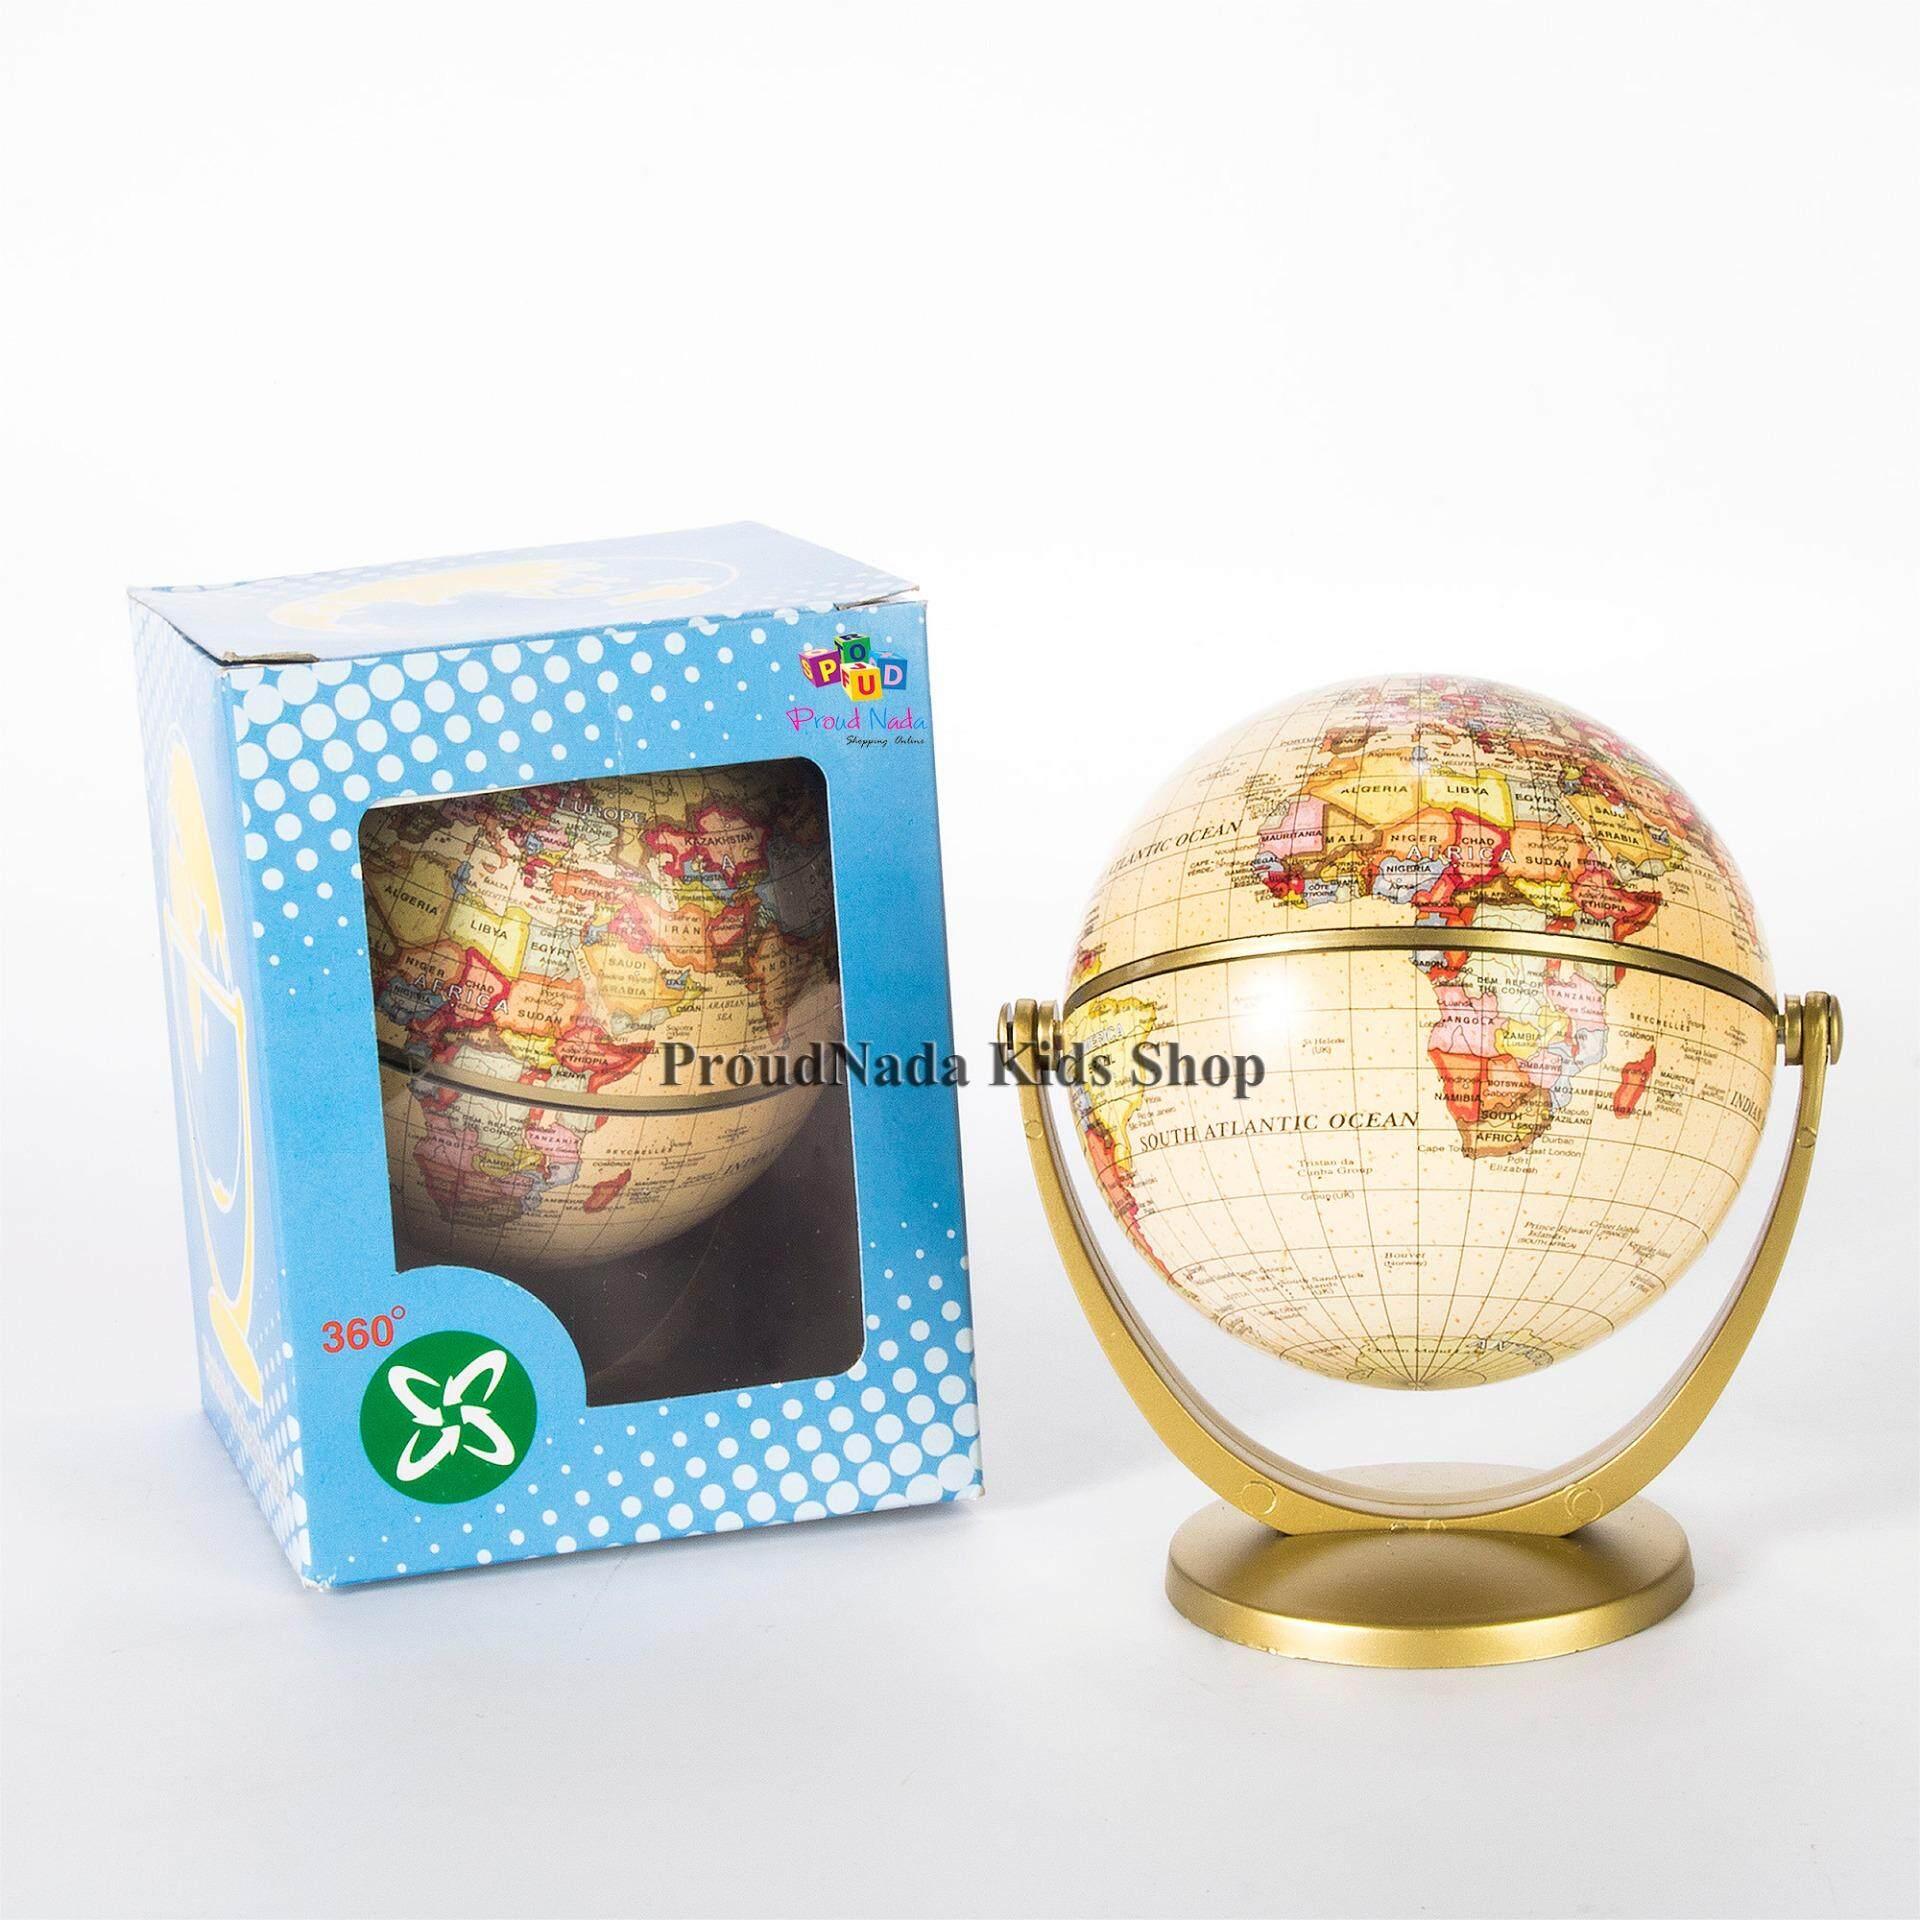 Proudnada Toys แผนที่ลูกโลกจำลอง 4 นิ้ว หมุนได้ 360 องศา Swivel-And Tiltable Globe No.100yd-3.